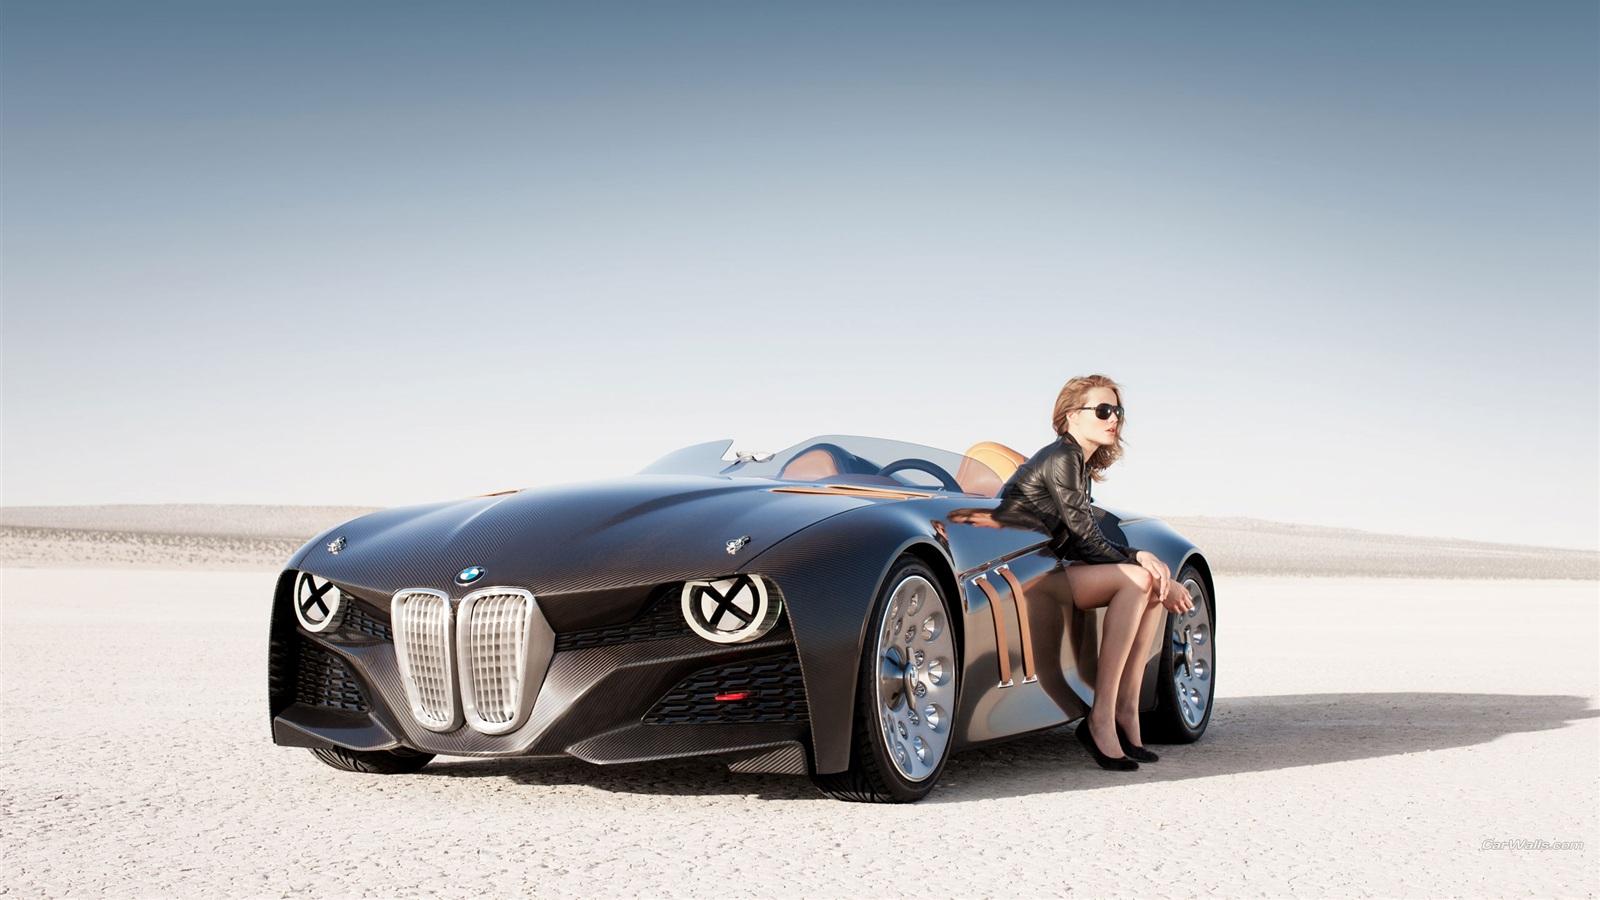 Bmw Schwarz Cool Car 2560x1600 Hd Hintergrundbilder Hd Bild